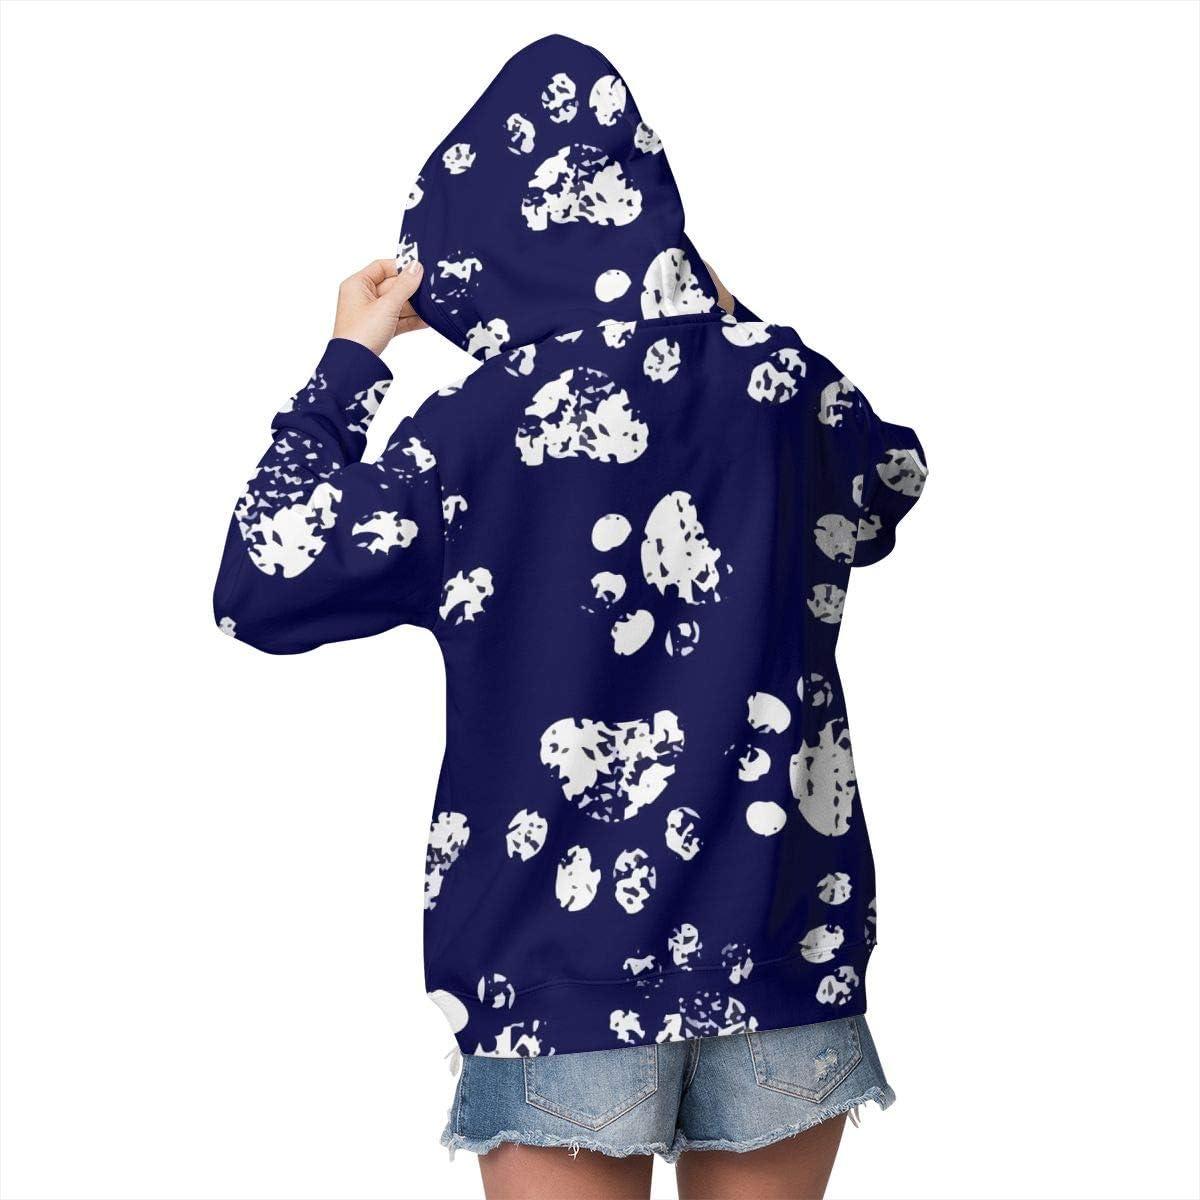 Paw Navy Womens Long Sleeve Pullover Hooded Sweatshirt Top Hoodie with Fleece Lining